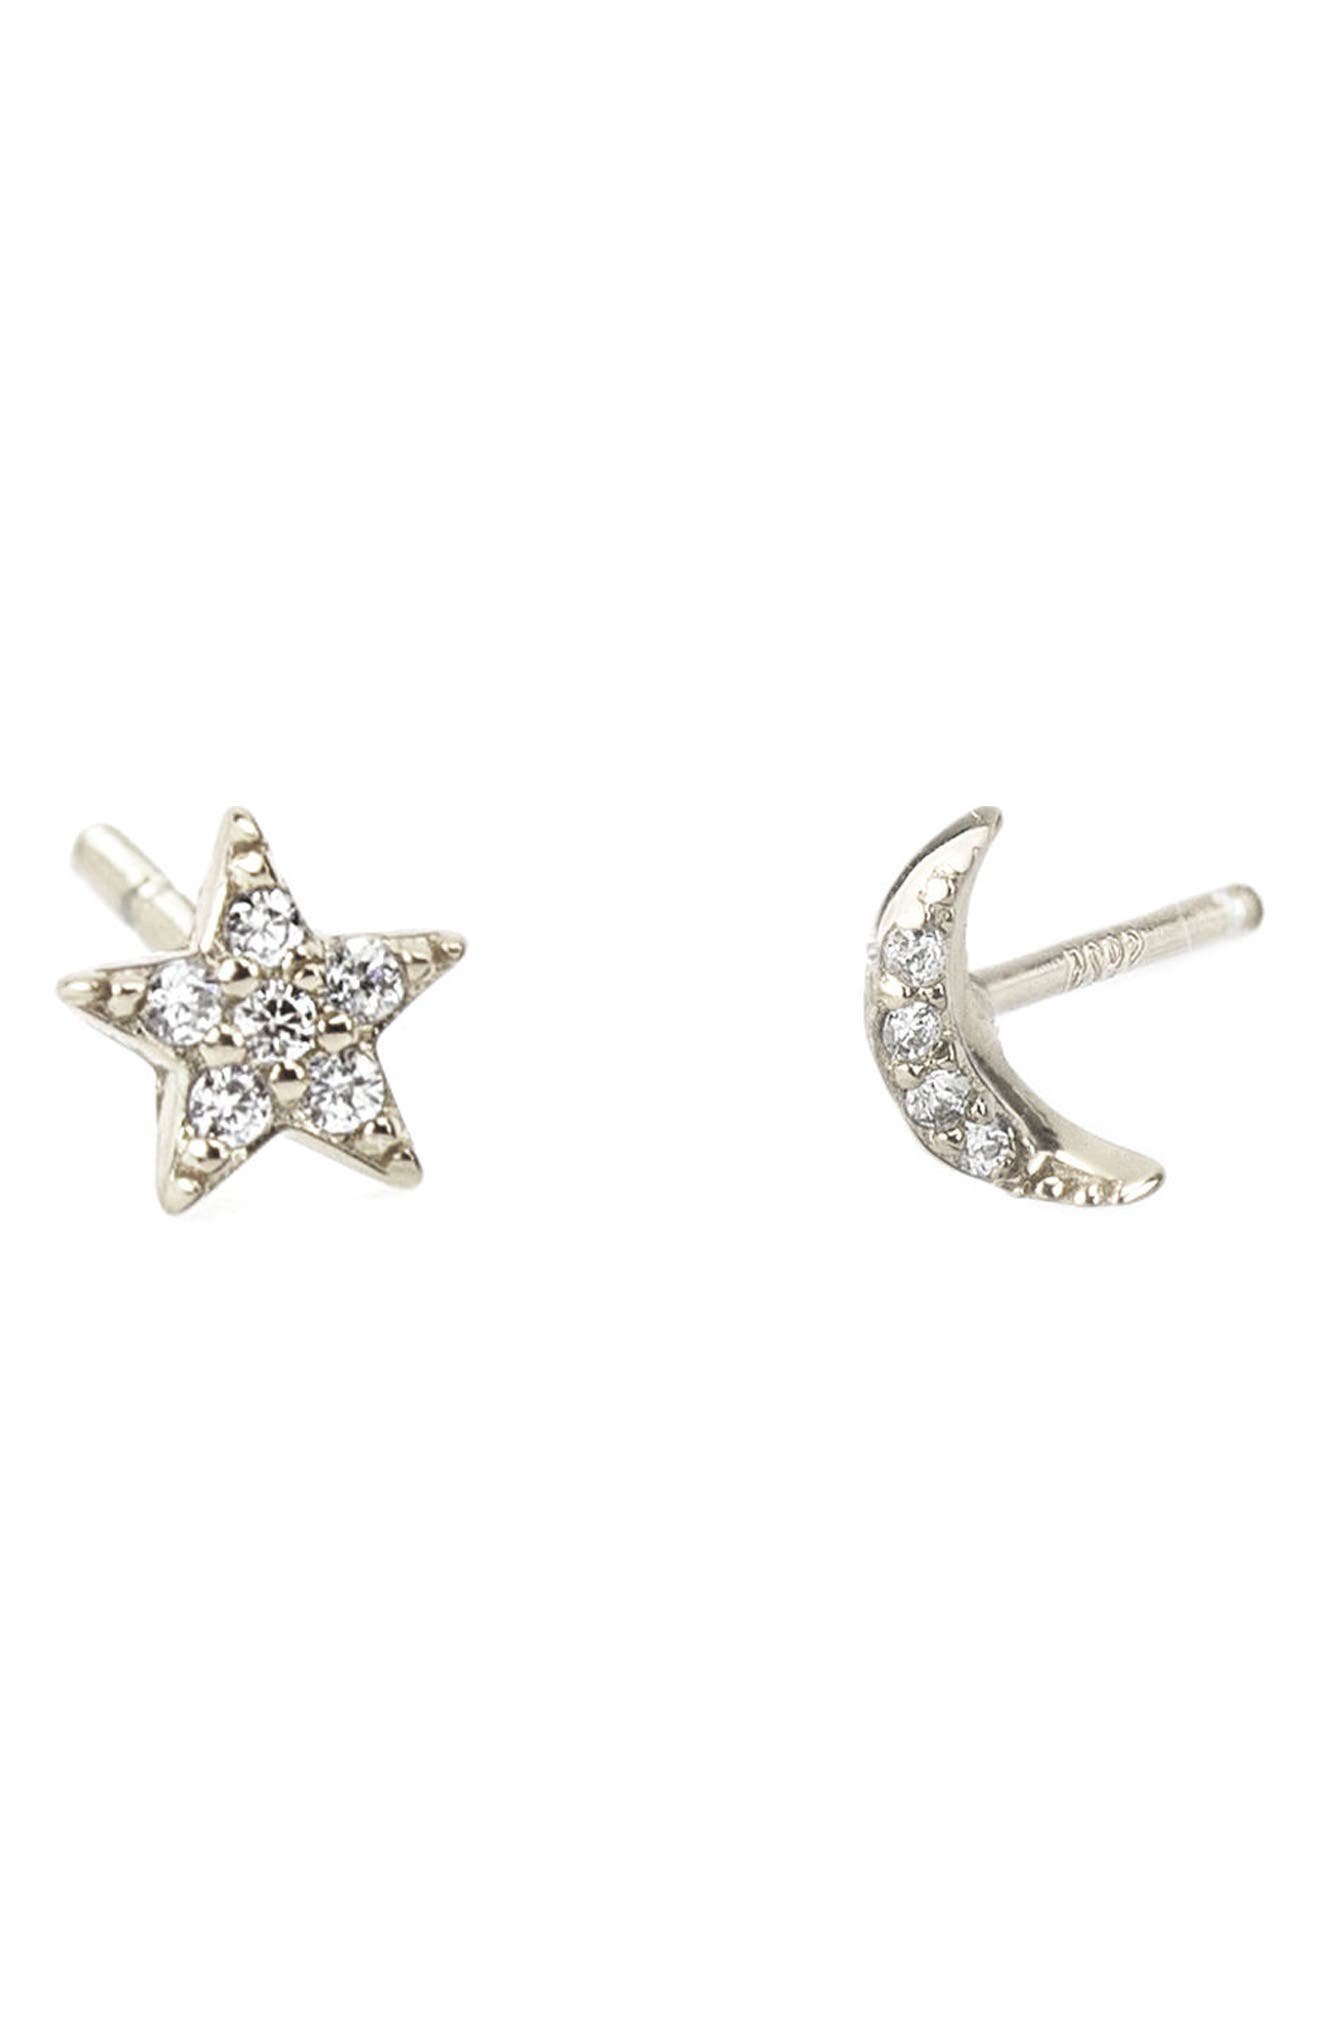 Pave Star & Moon Stud Earrings